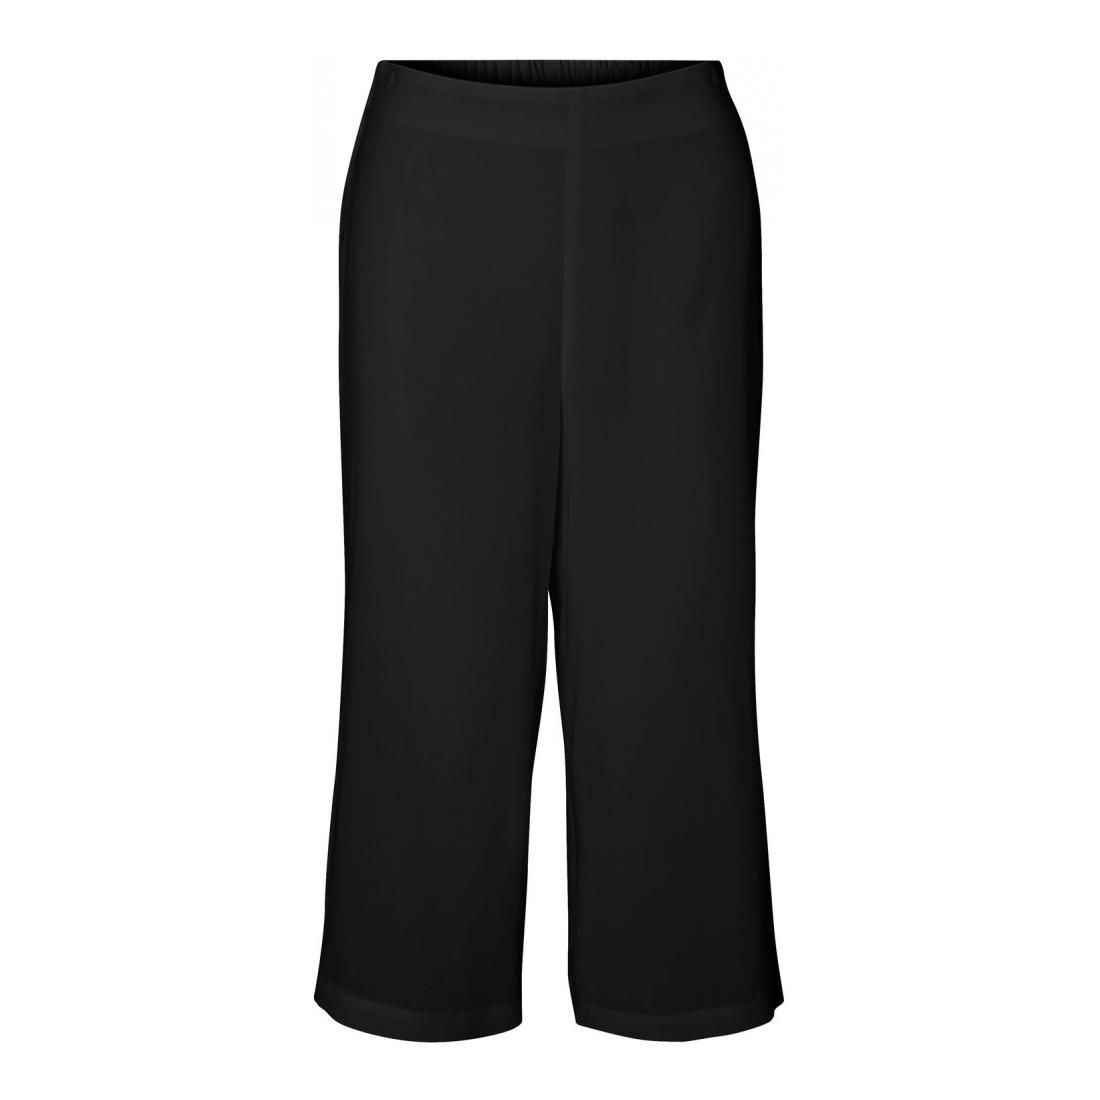 Vero Moda Joggingpants/Leggins Damen VMSIMPLY EASY HW CULOTTE